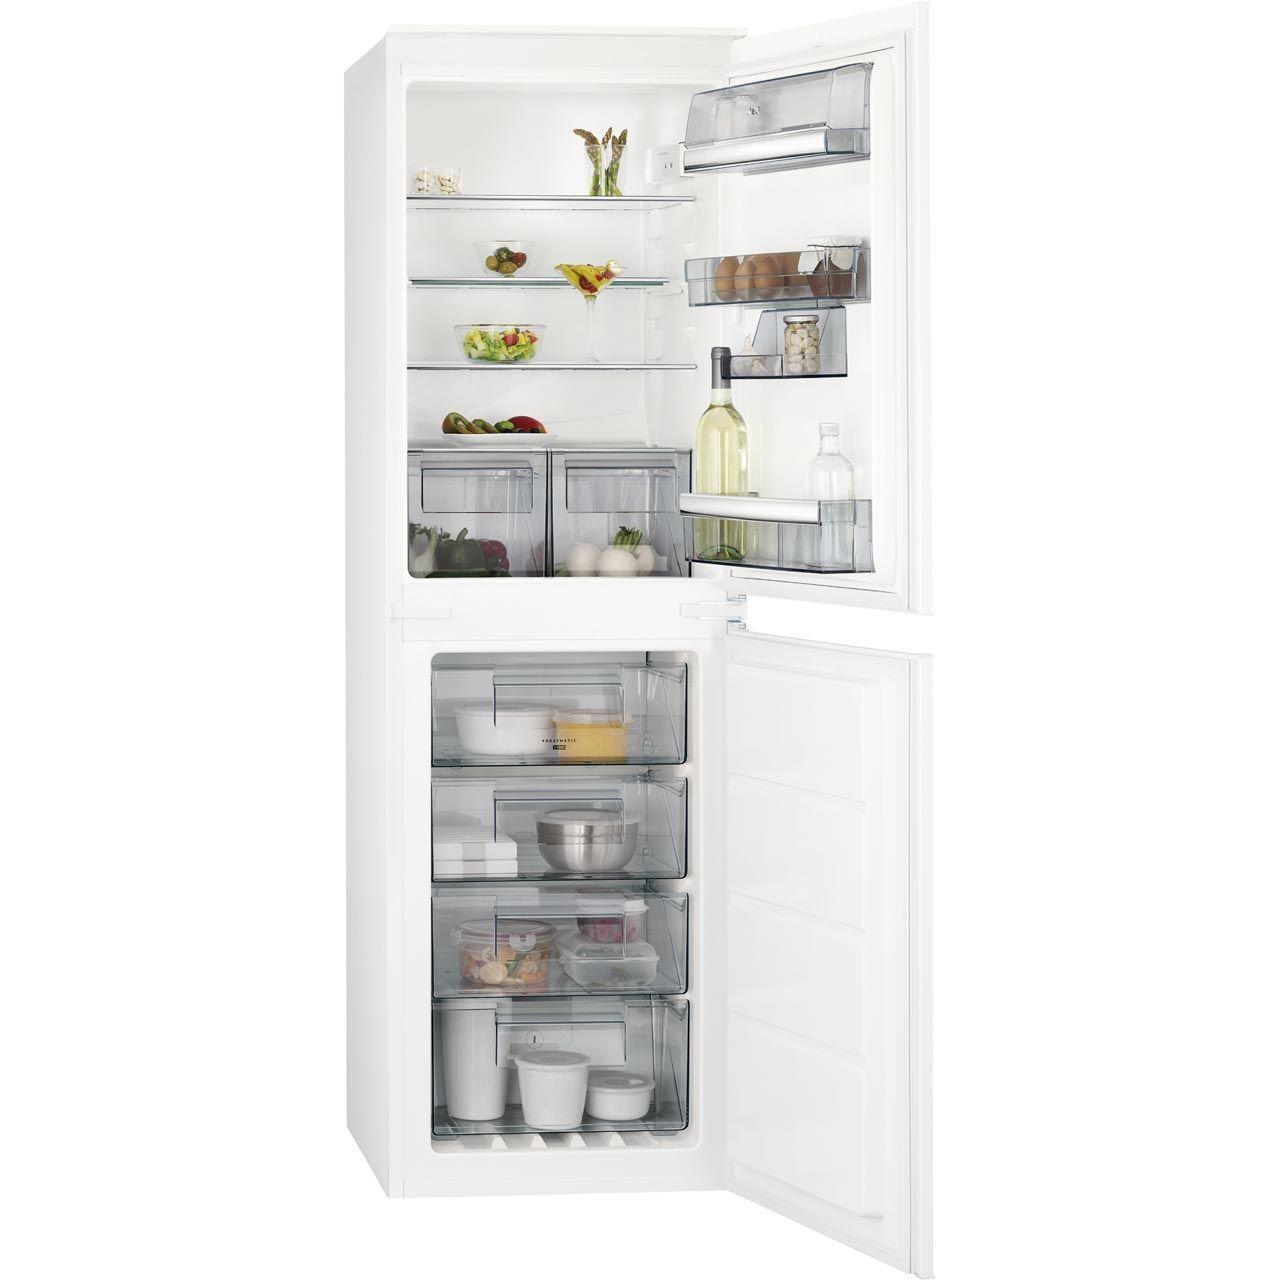 AEG SCS6181LNS Integrated 50/50 Frost Free Fridge Freezer with ...